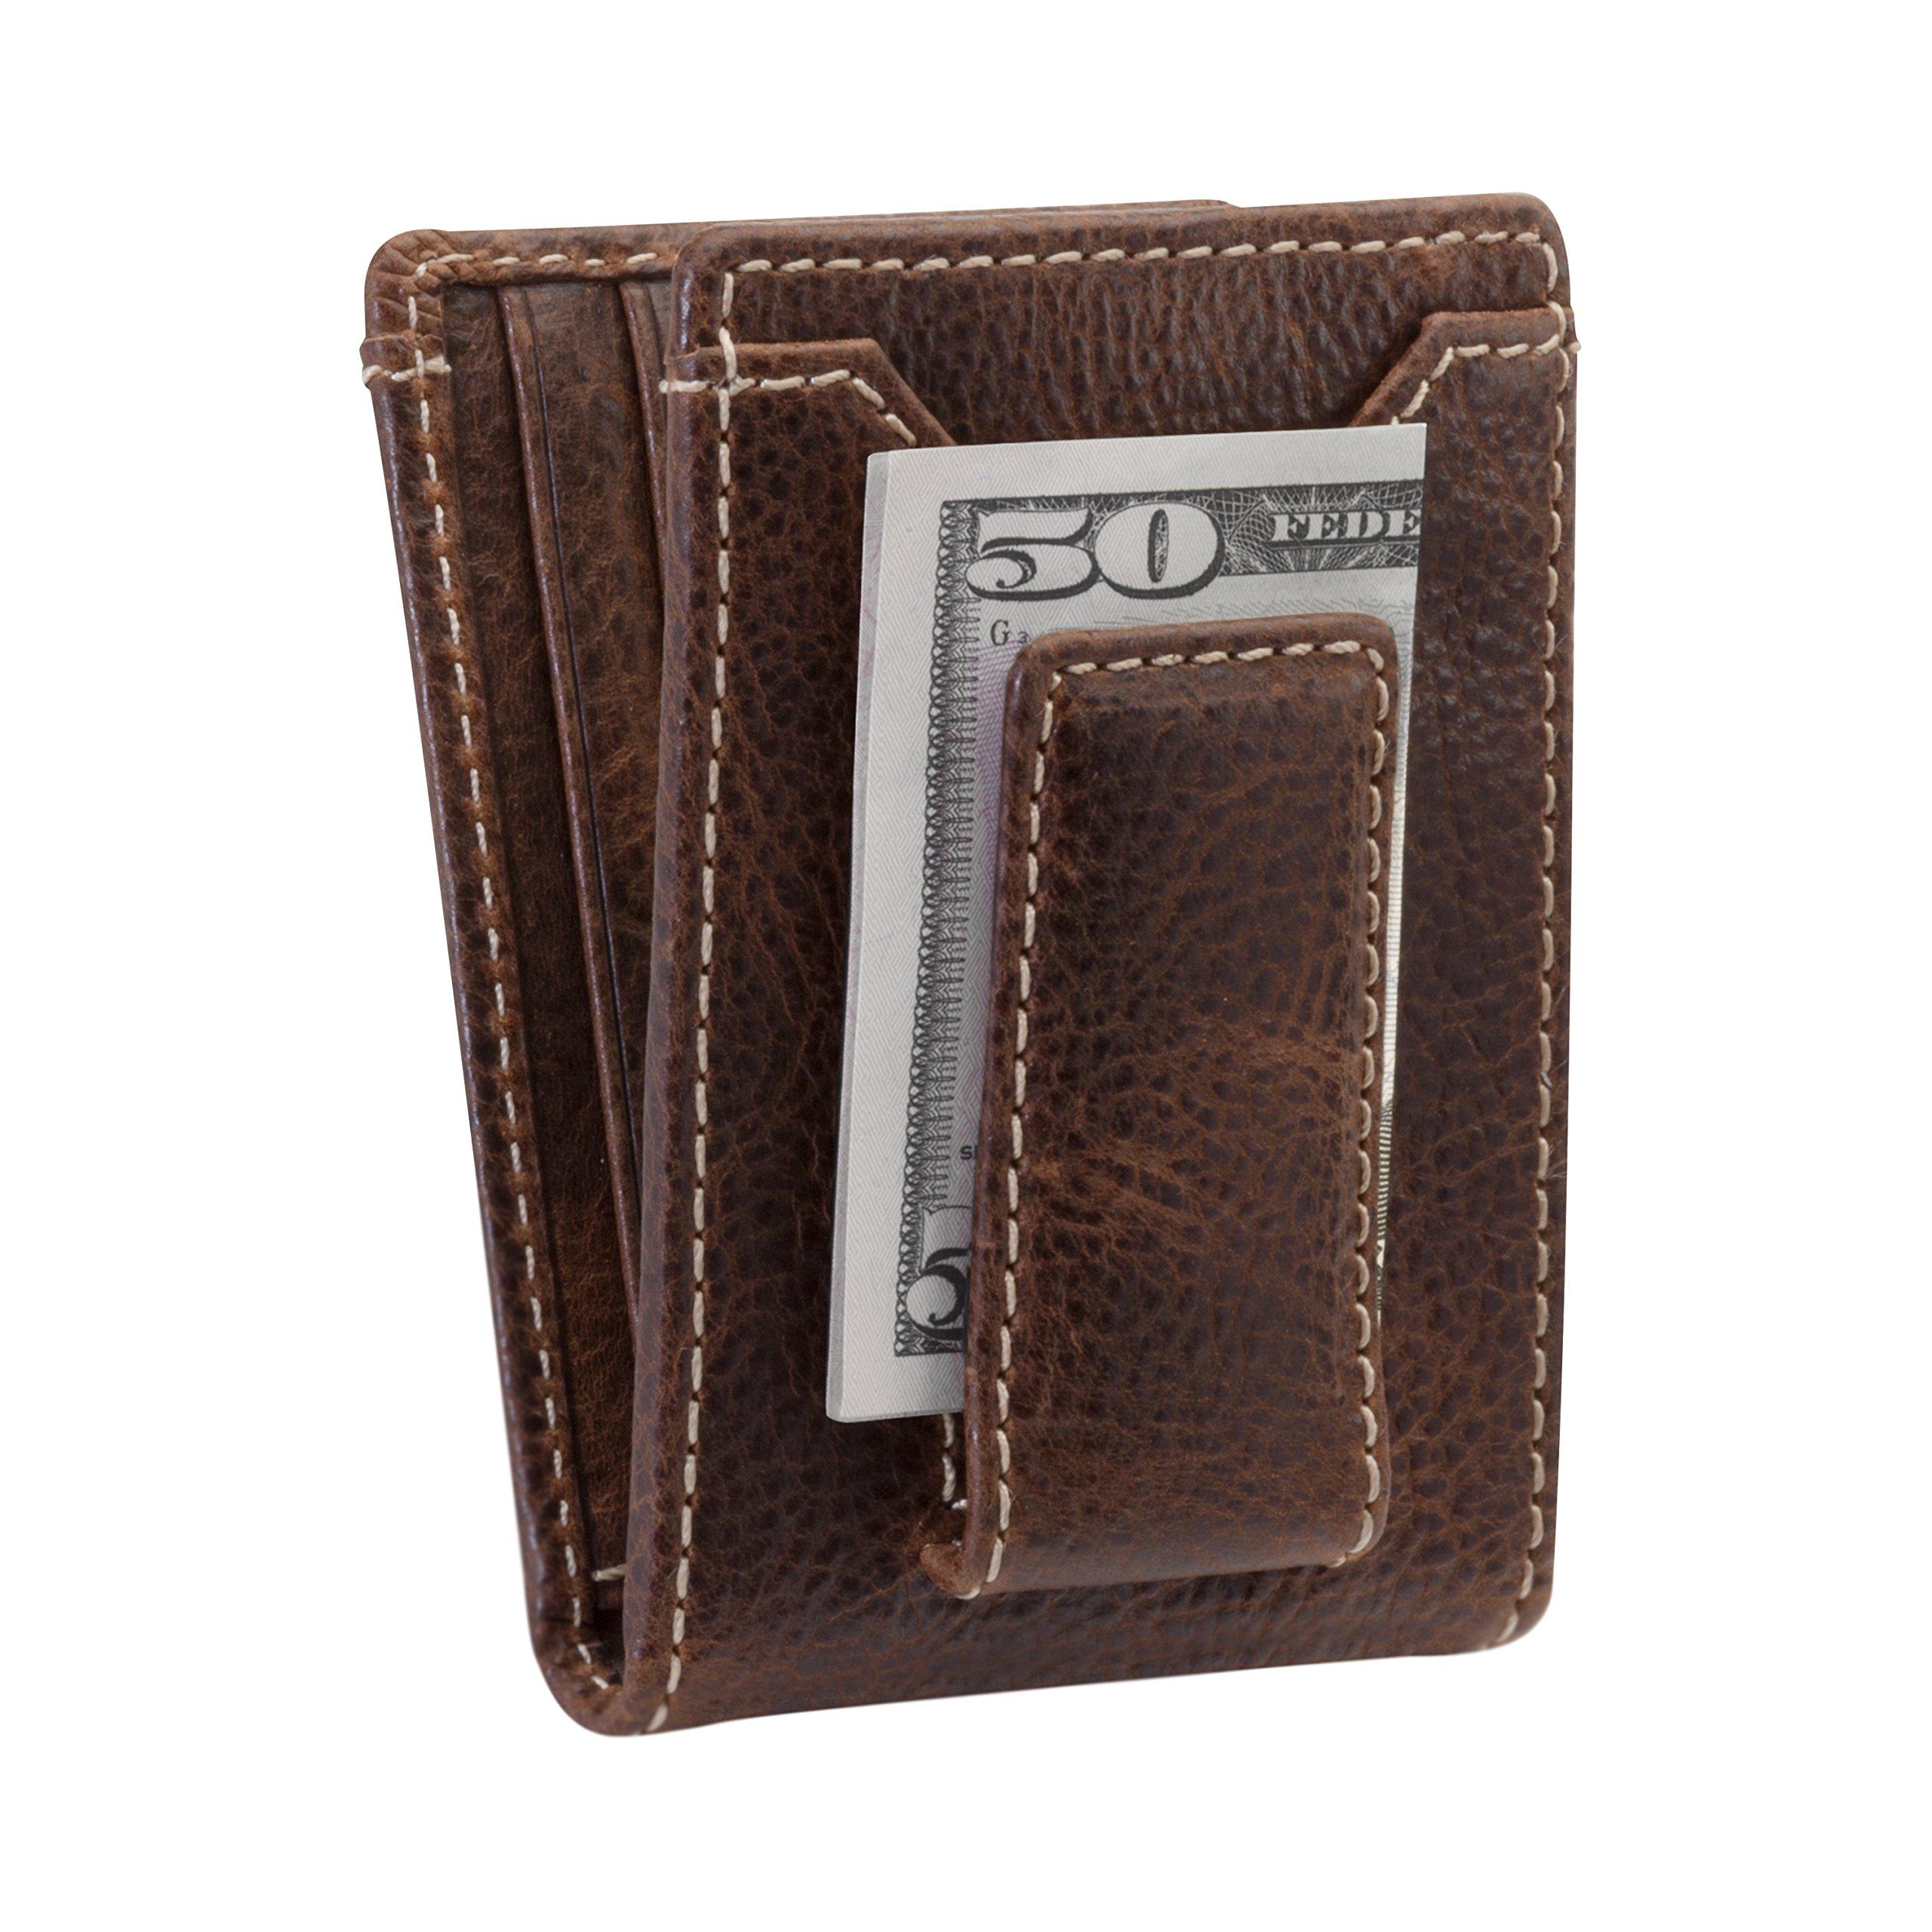 HOJ Co. IVAR ID BIFOLD Money Clip Wallet-Full Grain Leather-Magnetic Front Pocket Wallet (brown)